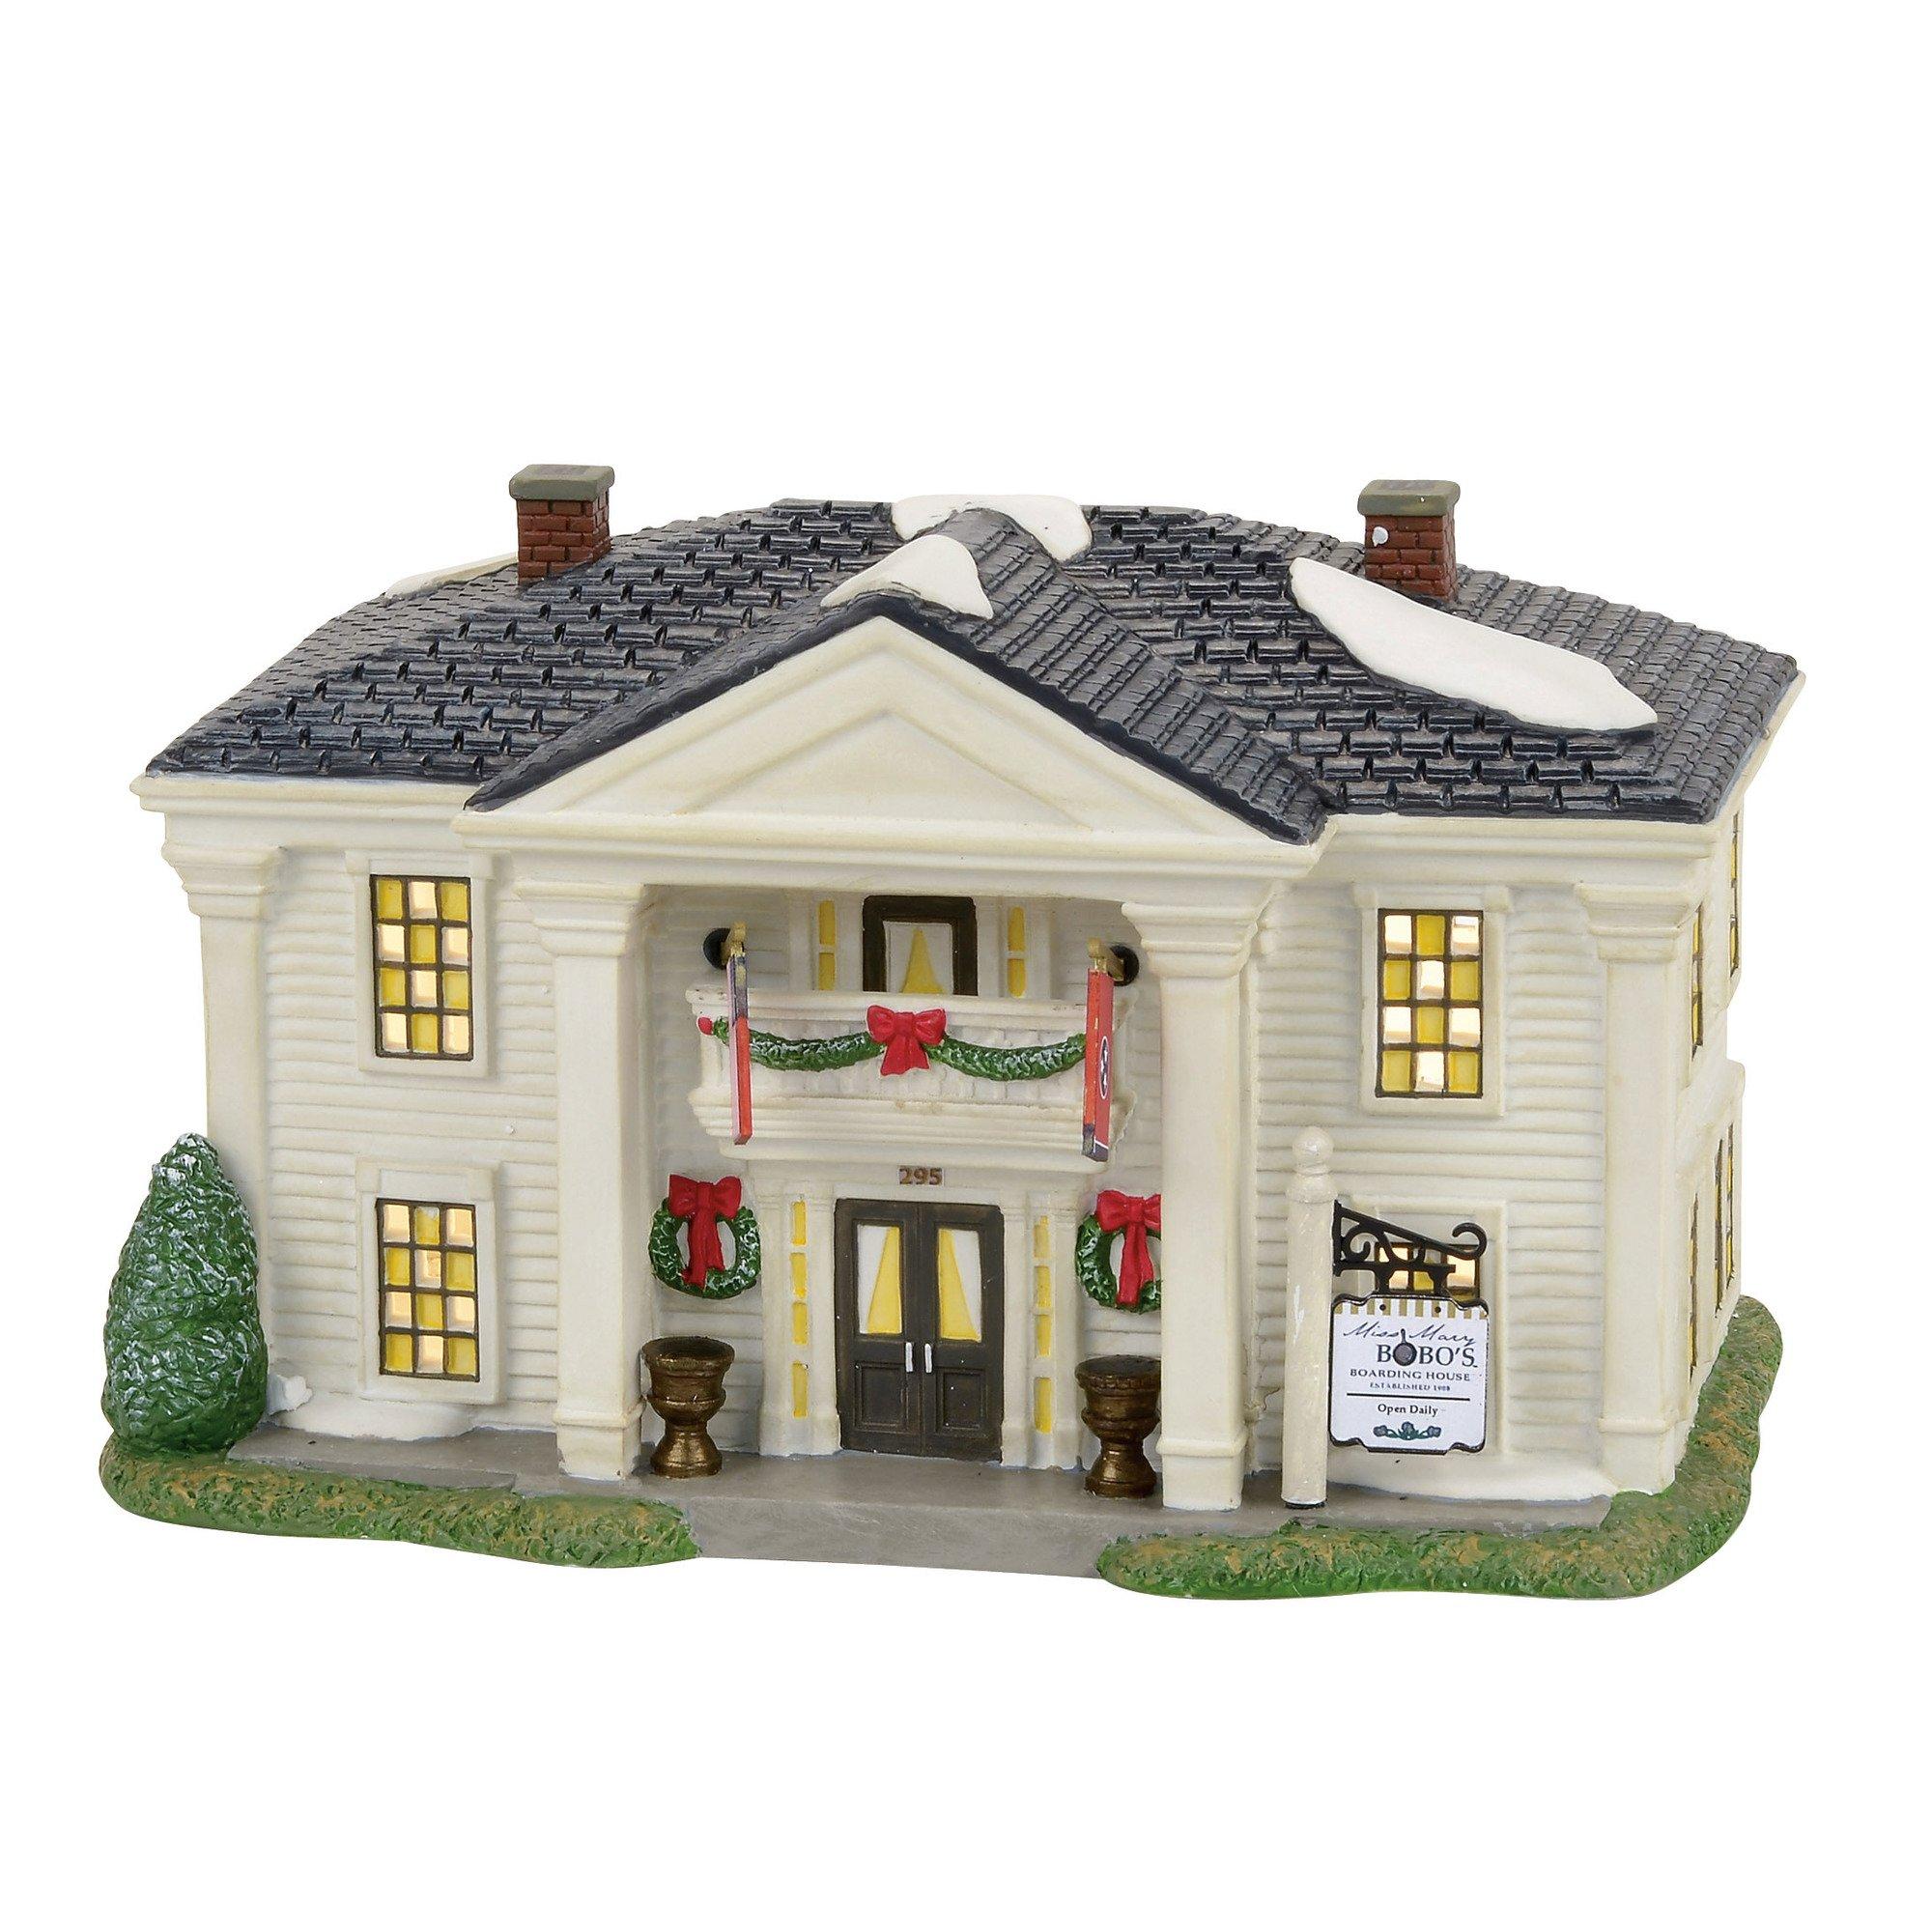 Department 56 Jack Daniel's Miss Mary Bobo's Boarding House Village Lit Building, Multicolor